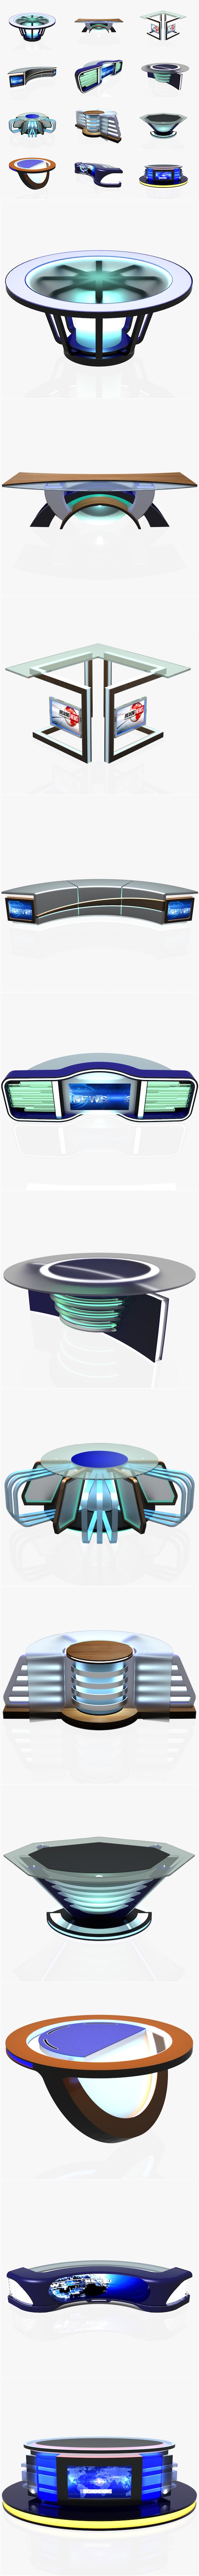 Virtual Tv Studio News Desk Collection (12 Pieces ) - 3DOcean Item for Sale